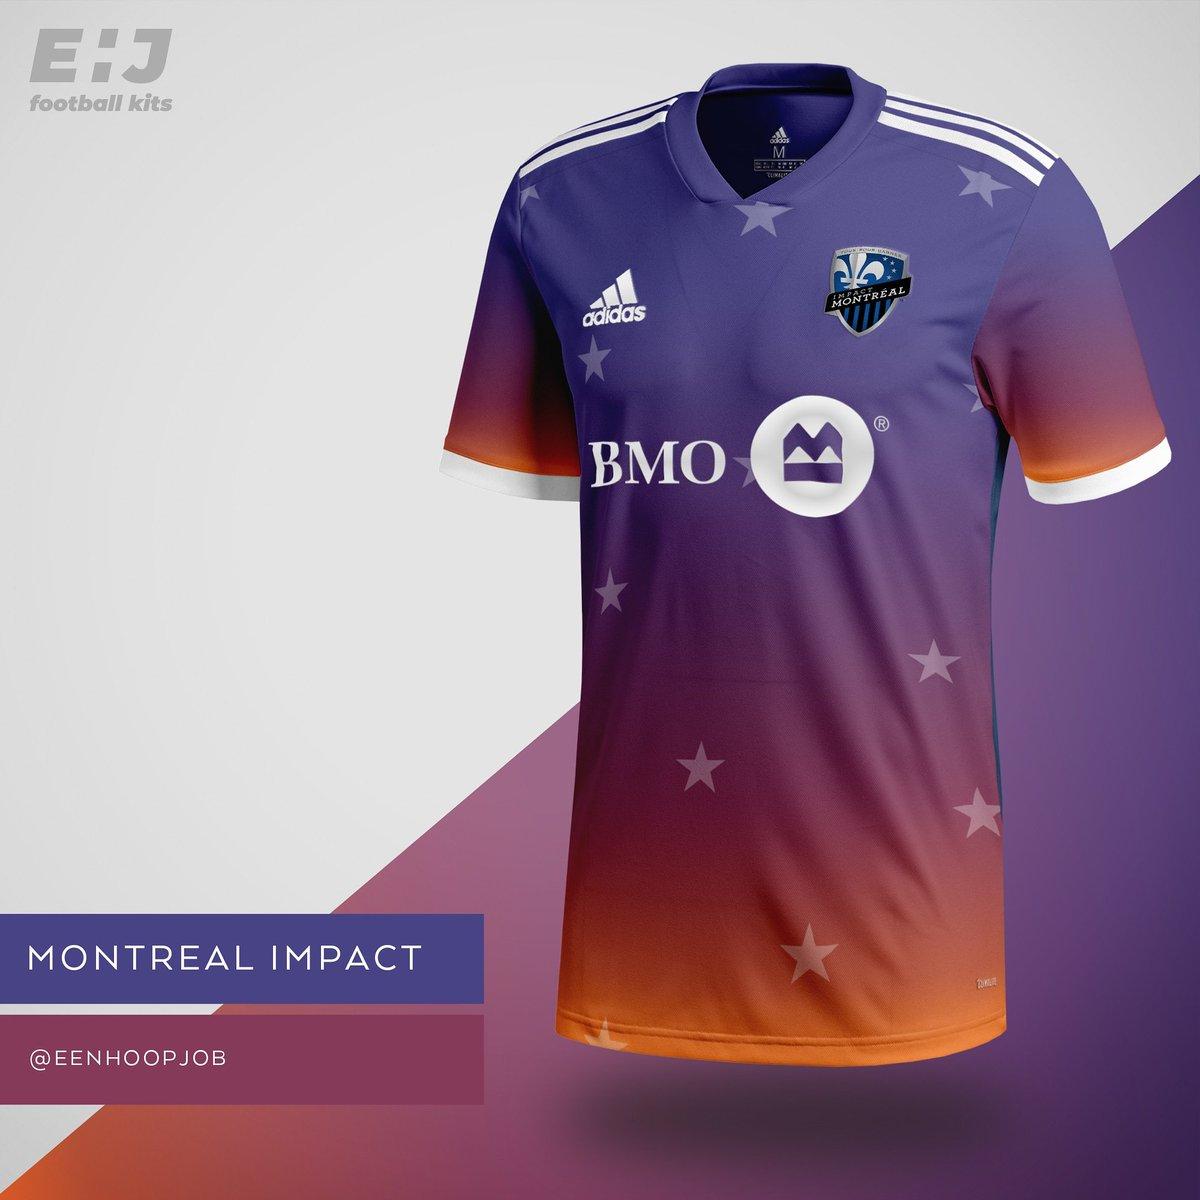 e991bf9cd Job - Eenhoopjob Football Kit Designs Montreal Impact    39 Montreal  39    montreal  montrealimpact  mls  soccer  adidas  adidassoccer adidasfootball  ...